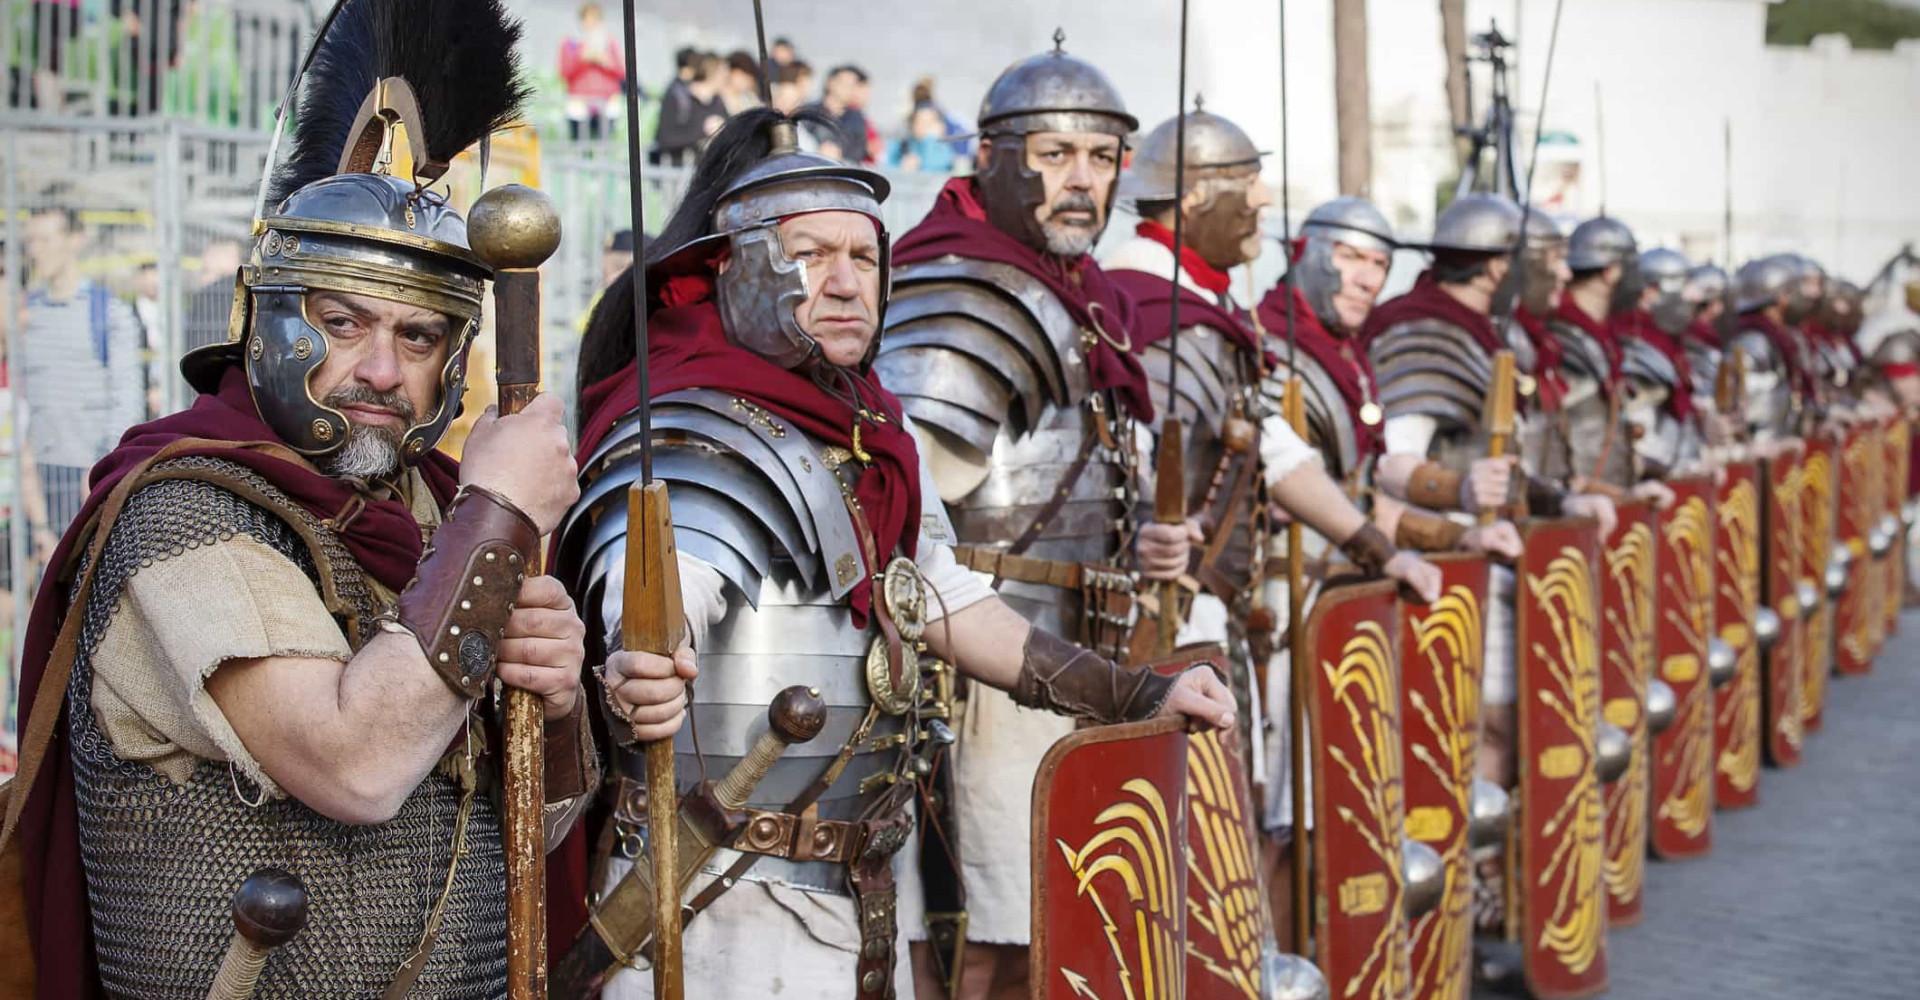 Descubra o incrível legado que os romanos deixaram à humanidade